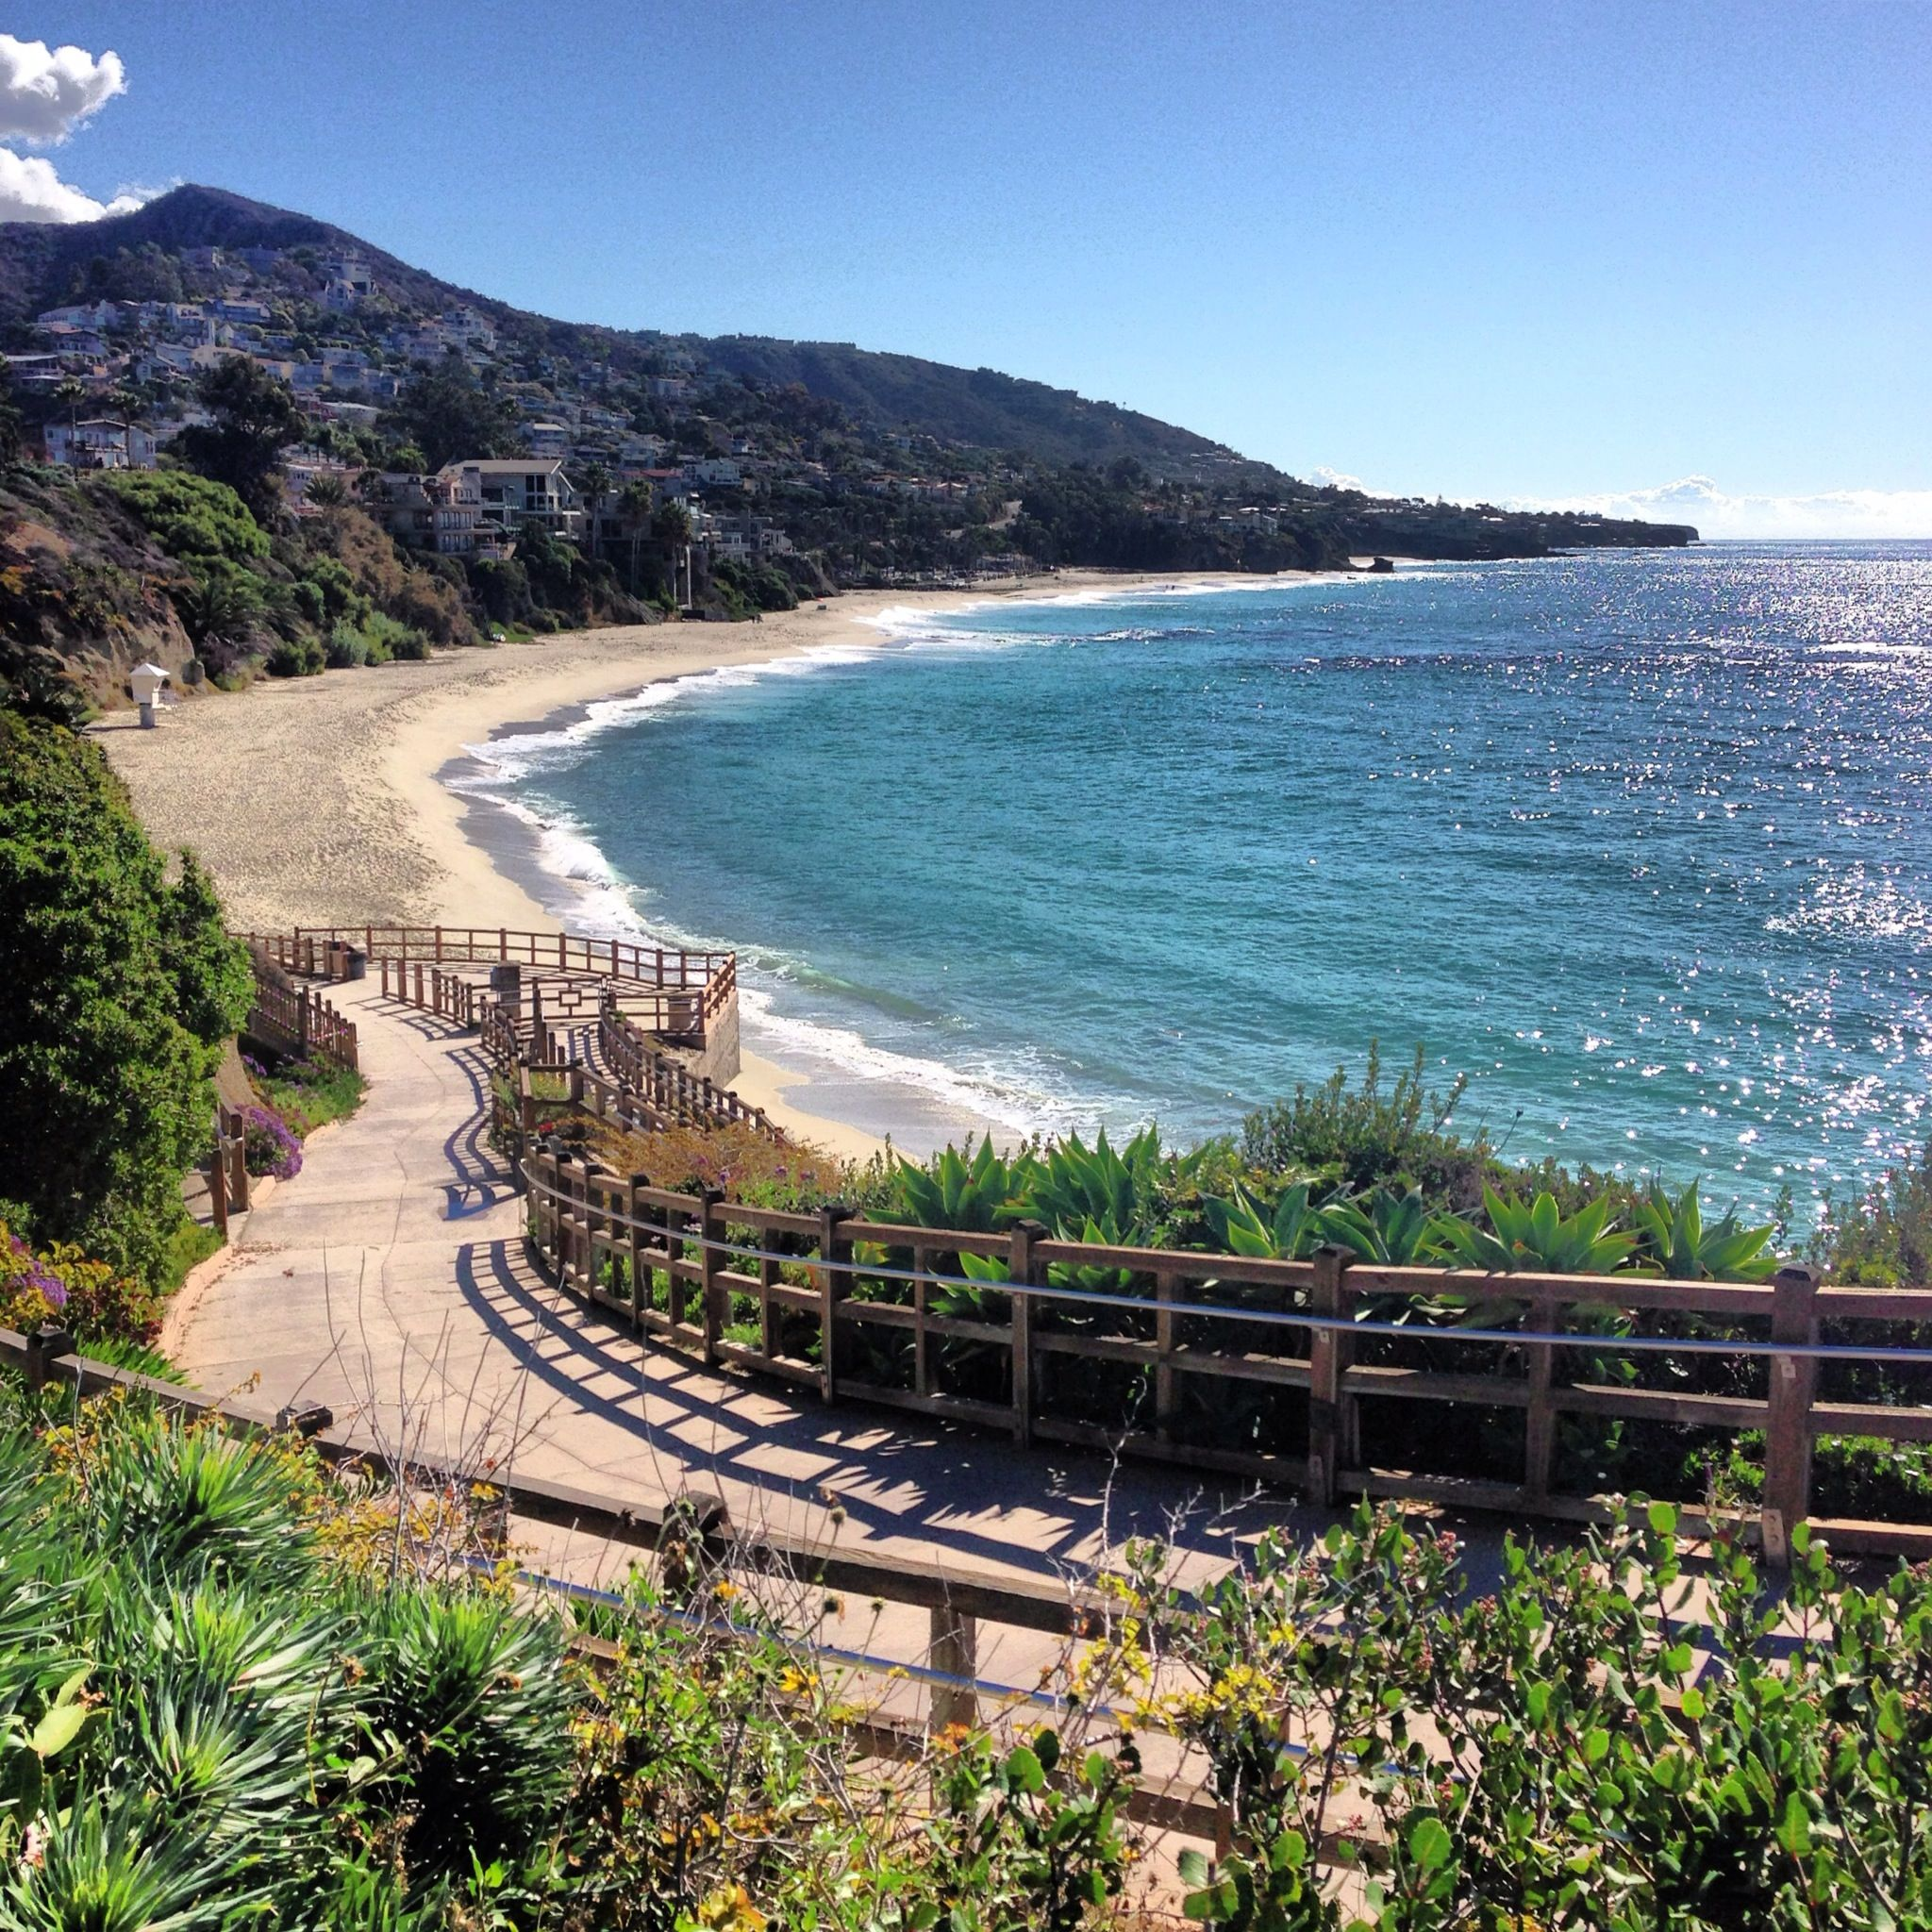 Treasure Island Beach: Treasure Island Beach, Laguna Beach, California